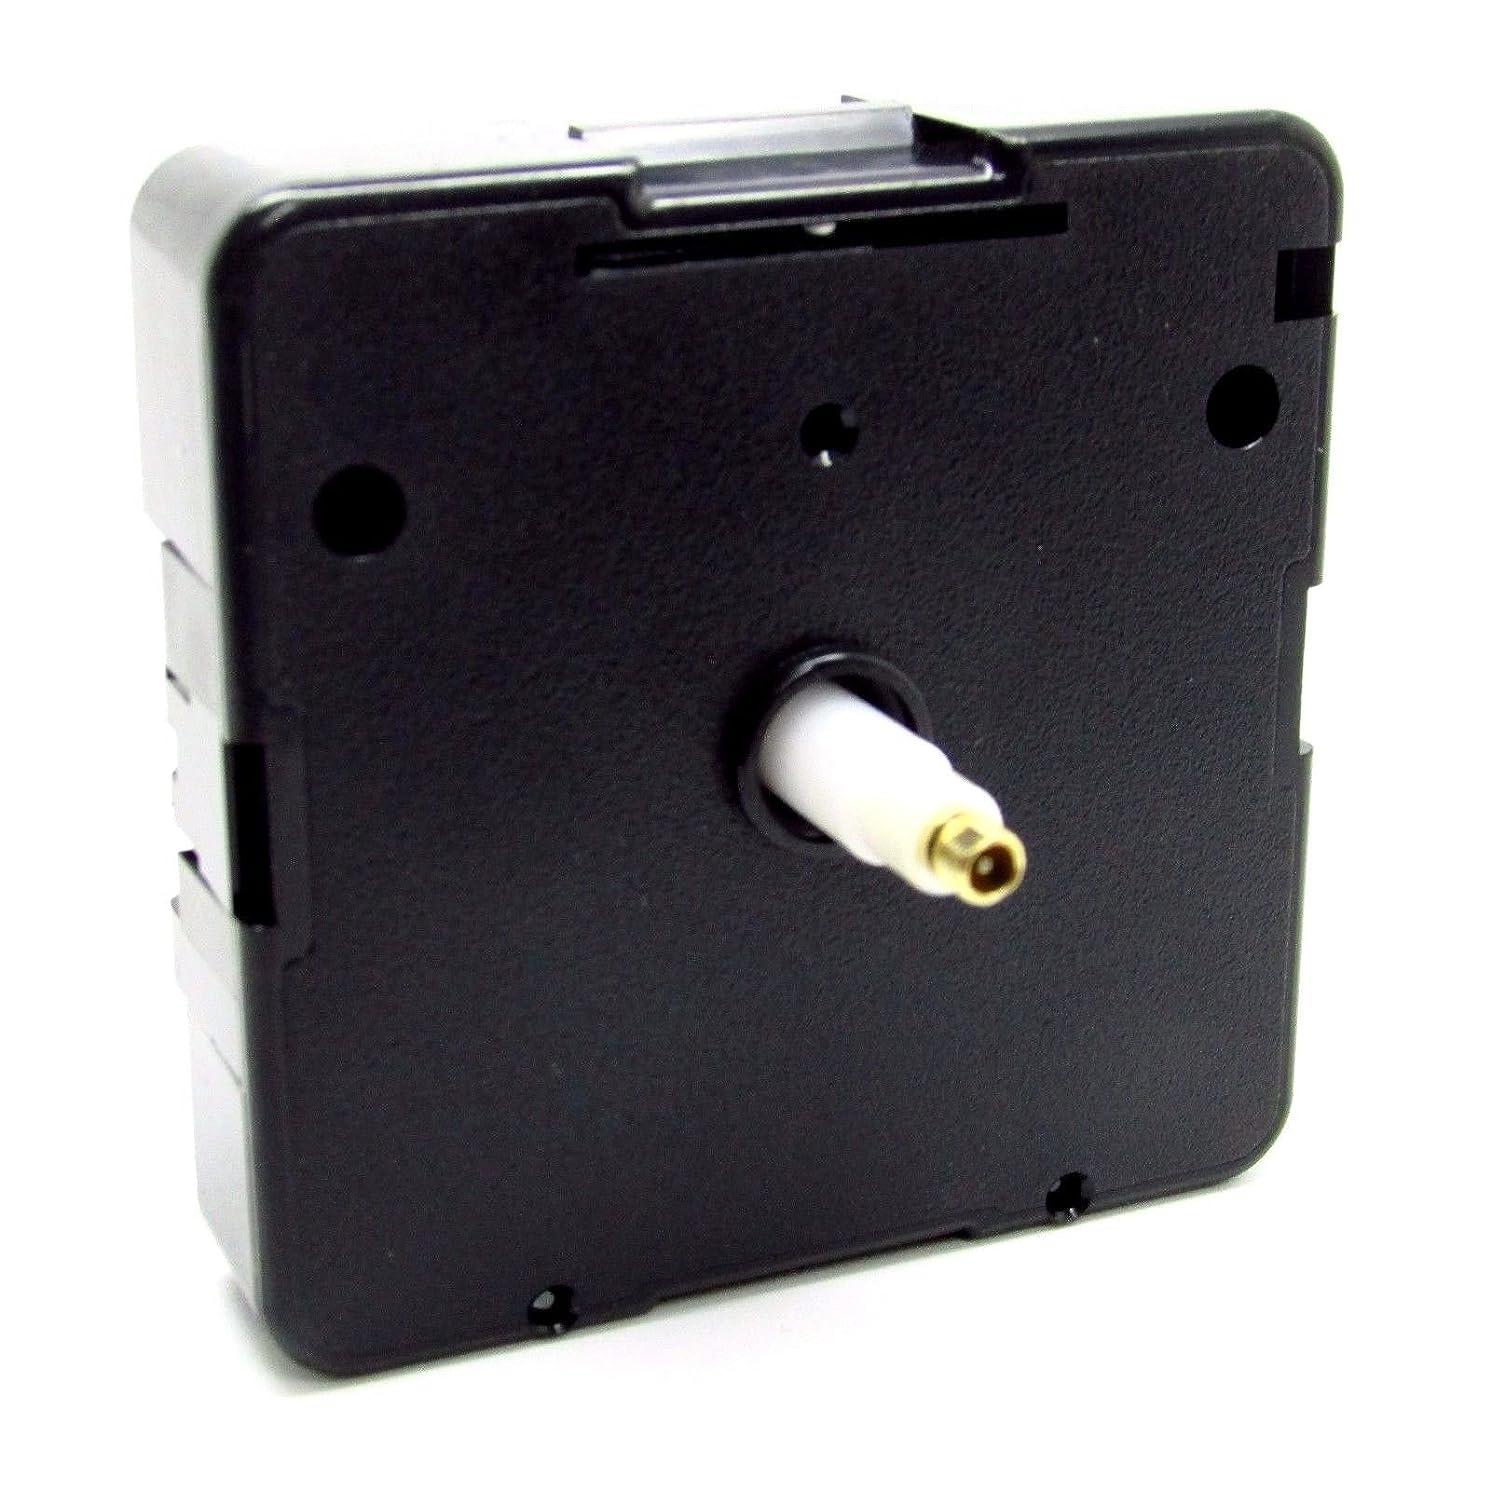 New Replacement UTS Quartz German Euroshaft Movement Mechanism Motor (16mm Shaft - Clock Faces 4-6mm Thick)